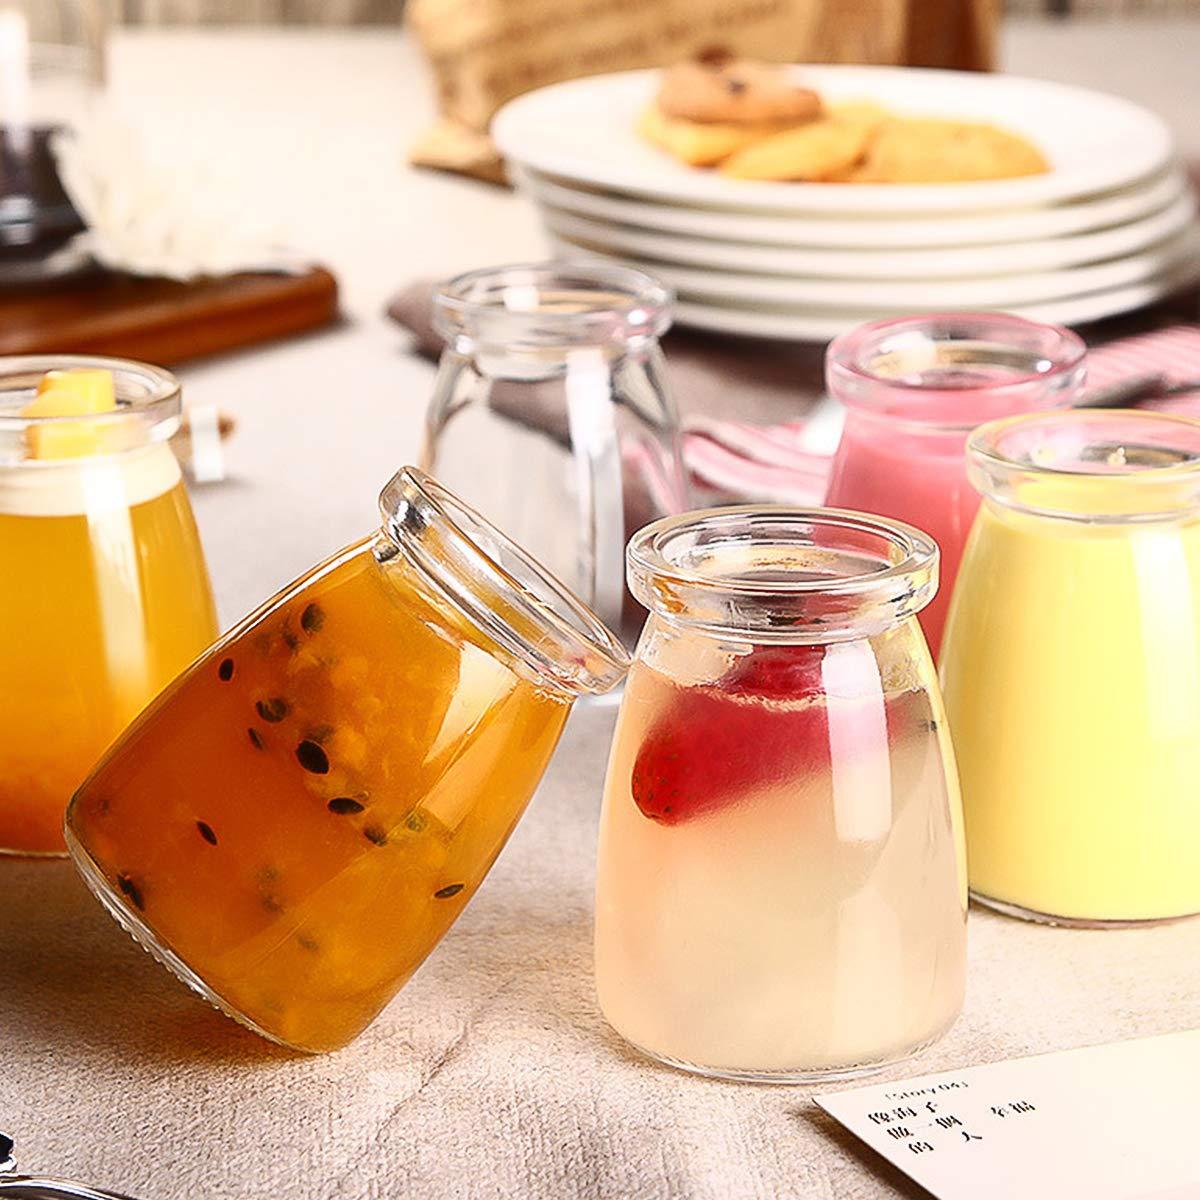 Glass Jars, KAMOTA 40 PACK 4oz Clear Yogurt Jars With PE Lids, Glass Pudding Jars Yogurt Jars Ideal for Jam, Honey, Wedding Favors, Shower Favors, Baby Foods (150ml) by KAMOTA (Image #5)